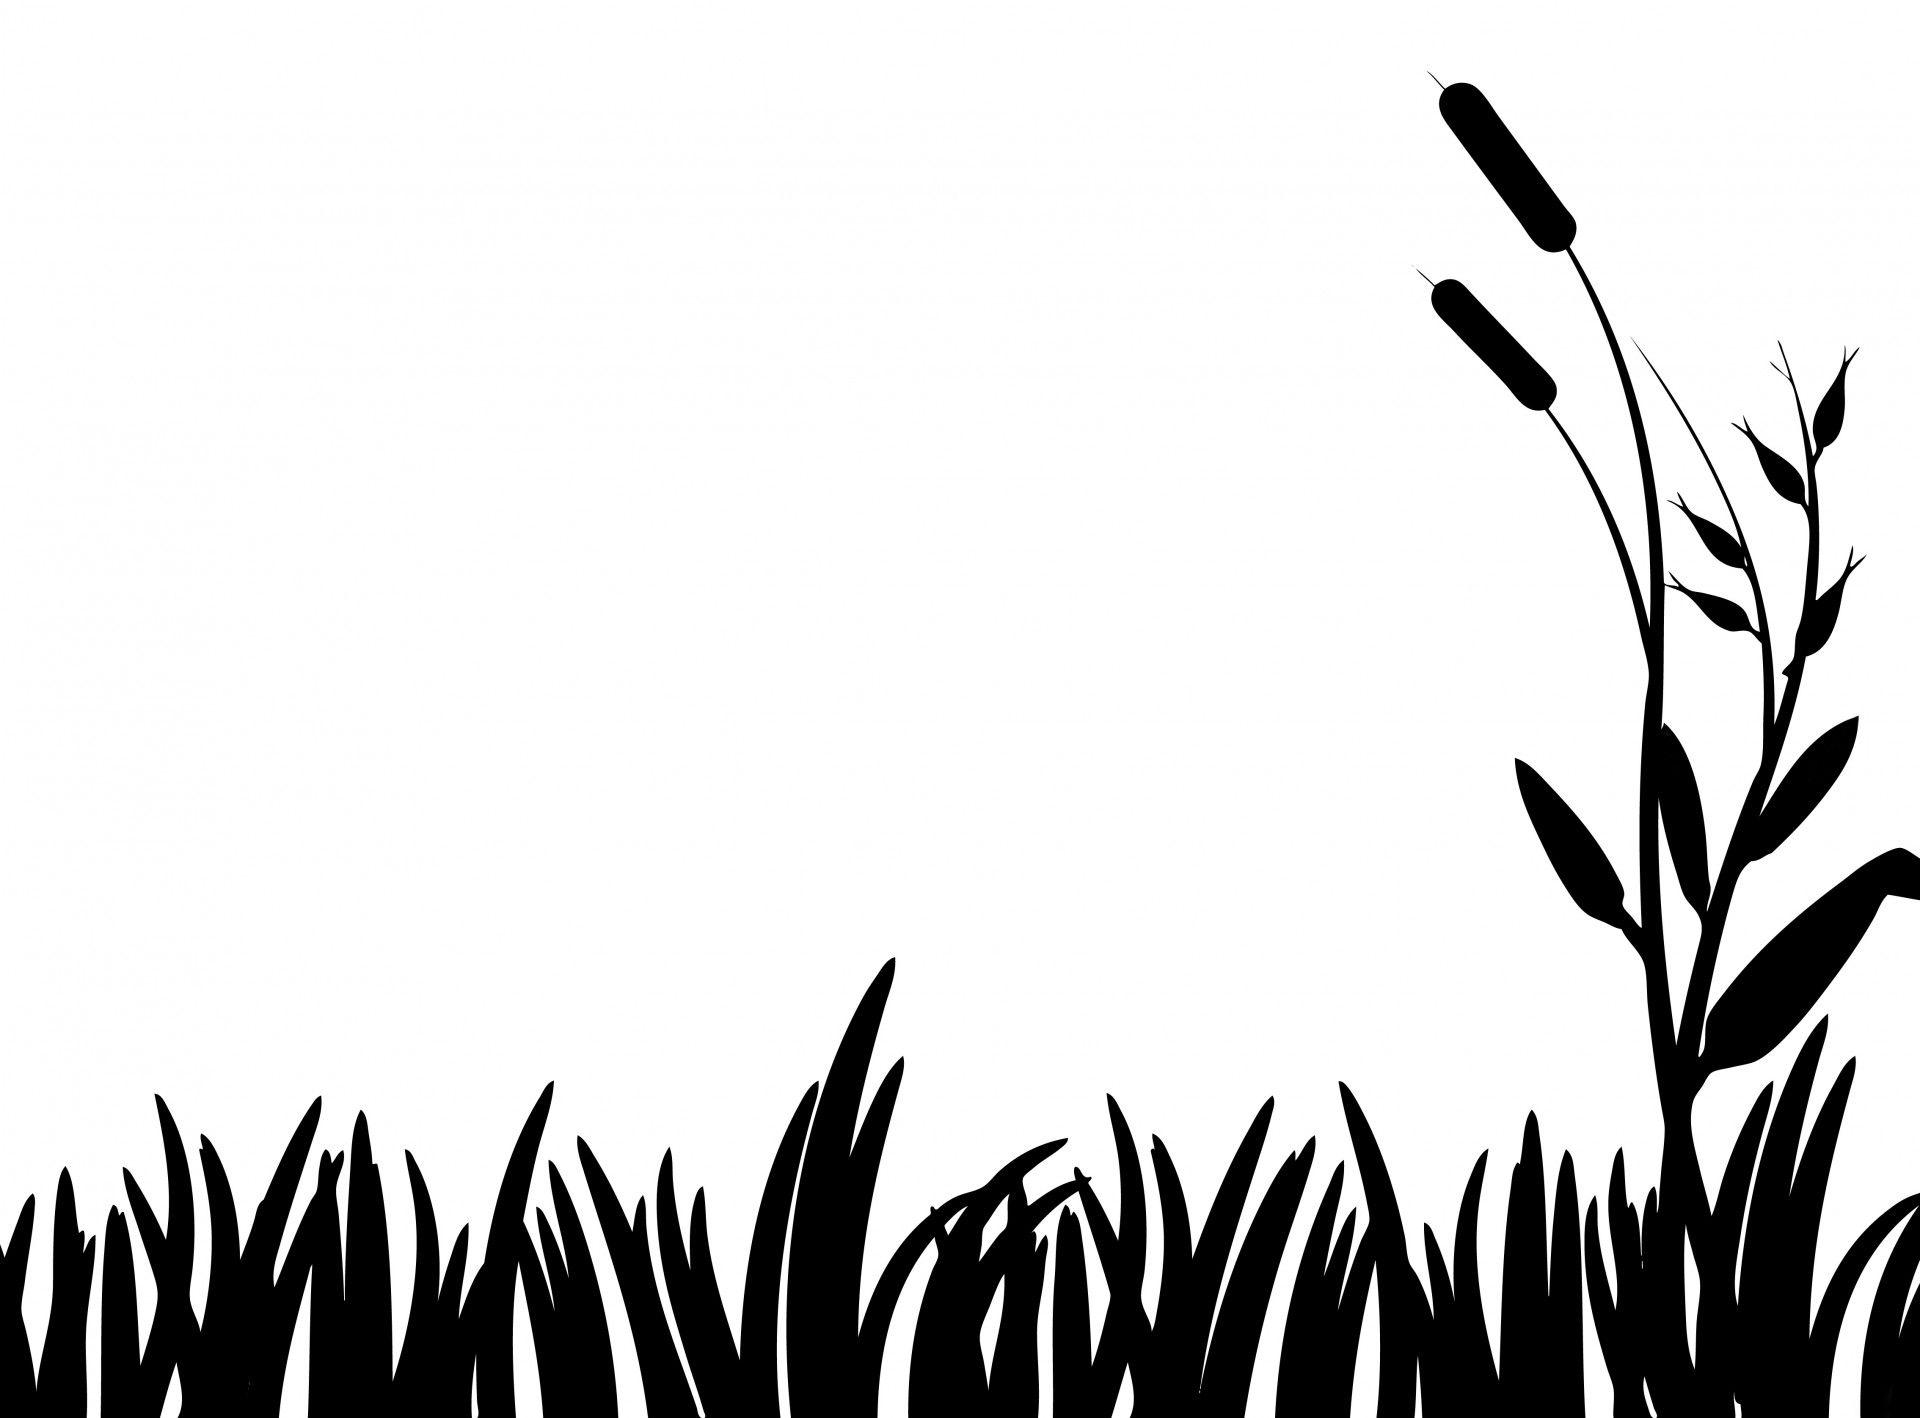 Stencils . Clipart grass silhouette